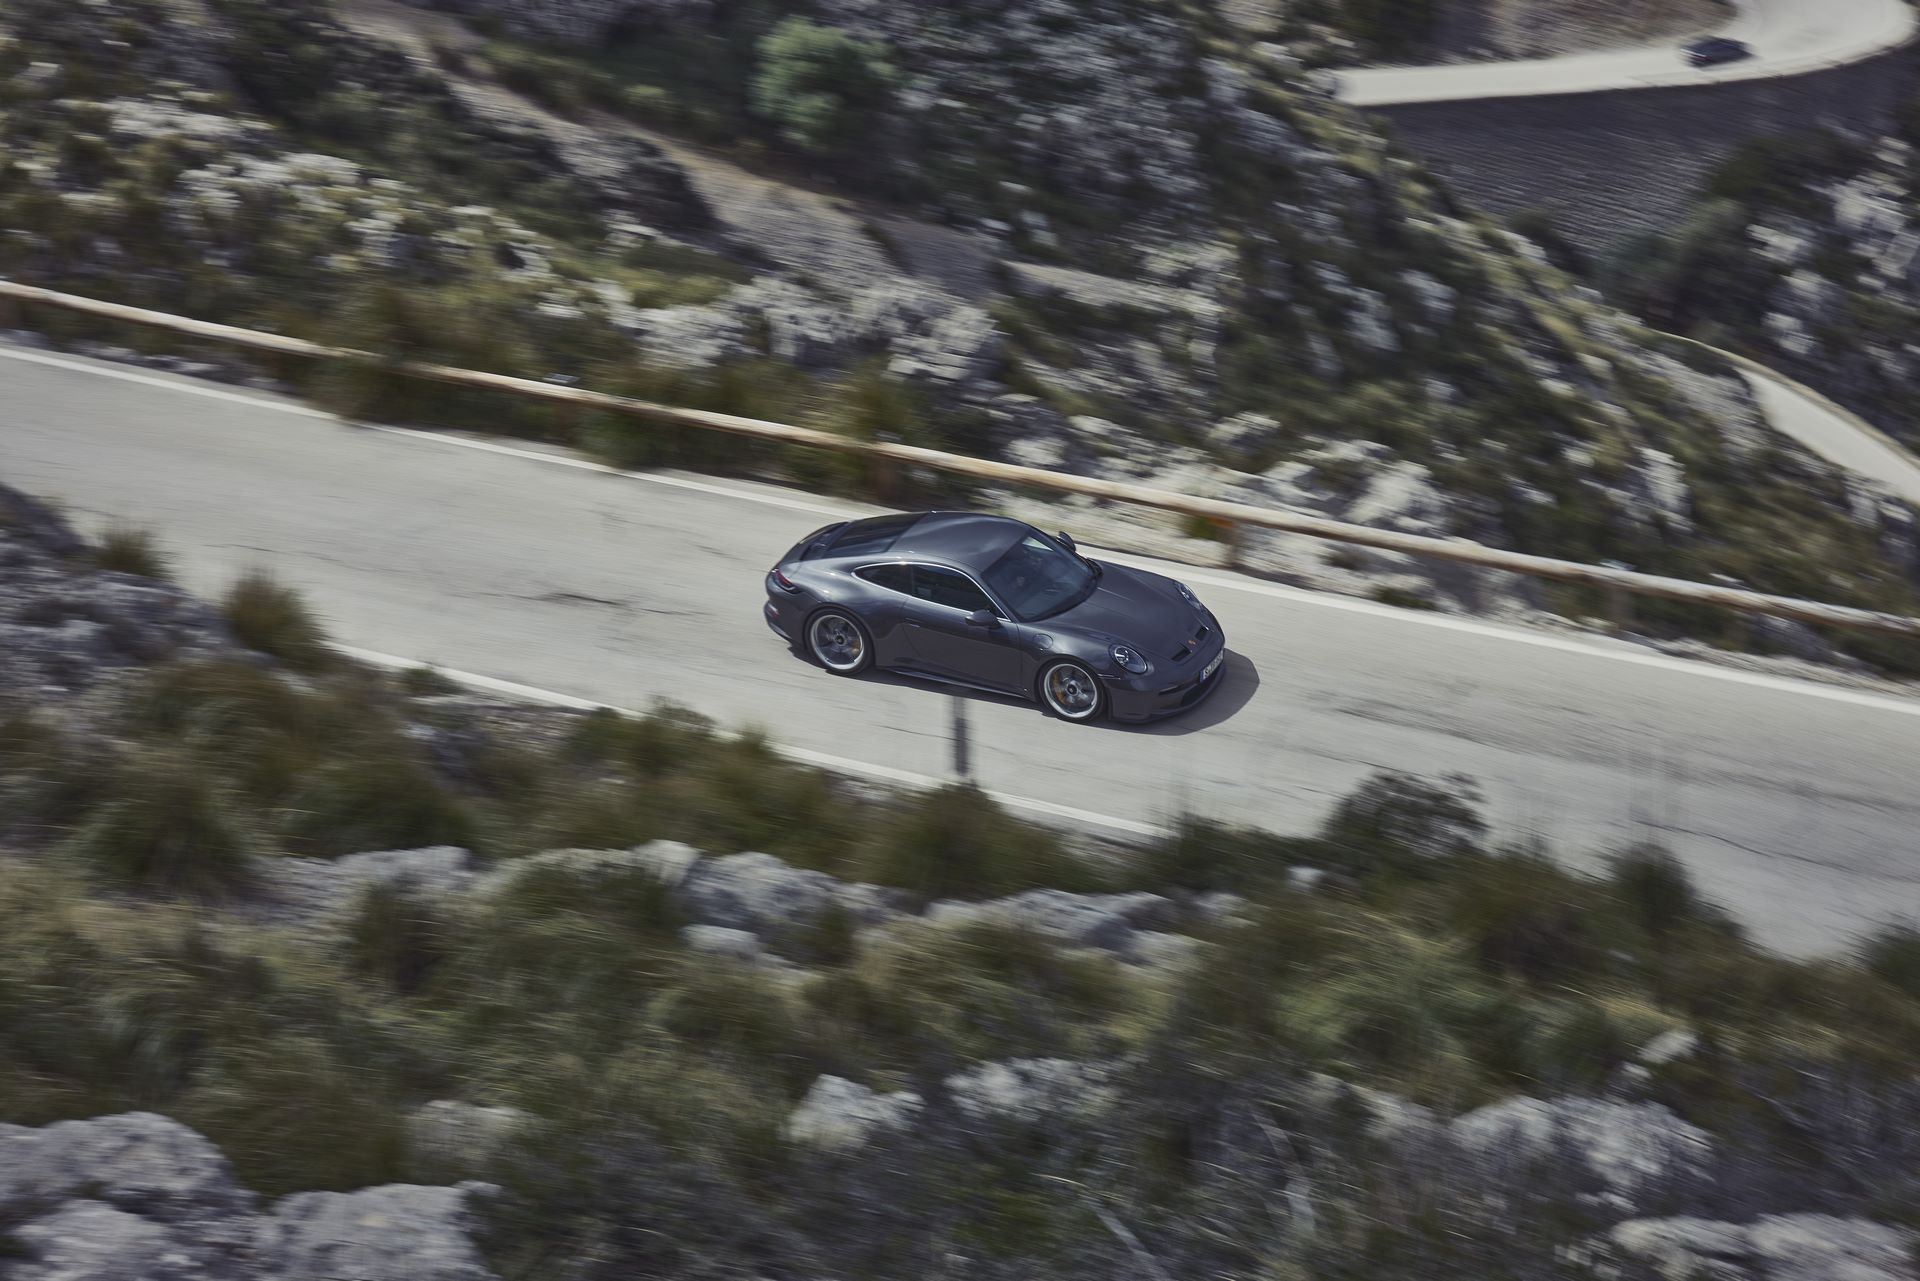 Porsche-911-GT3-Touring-Package-10